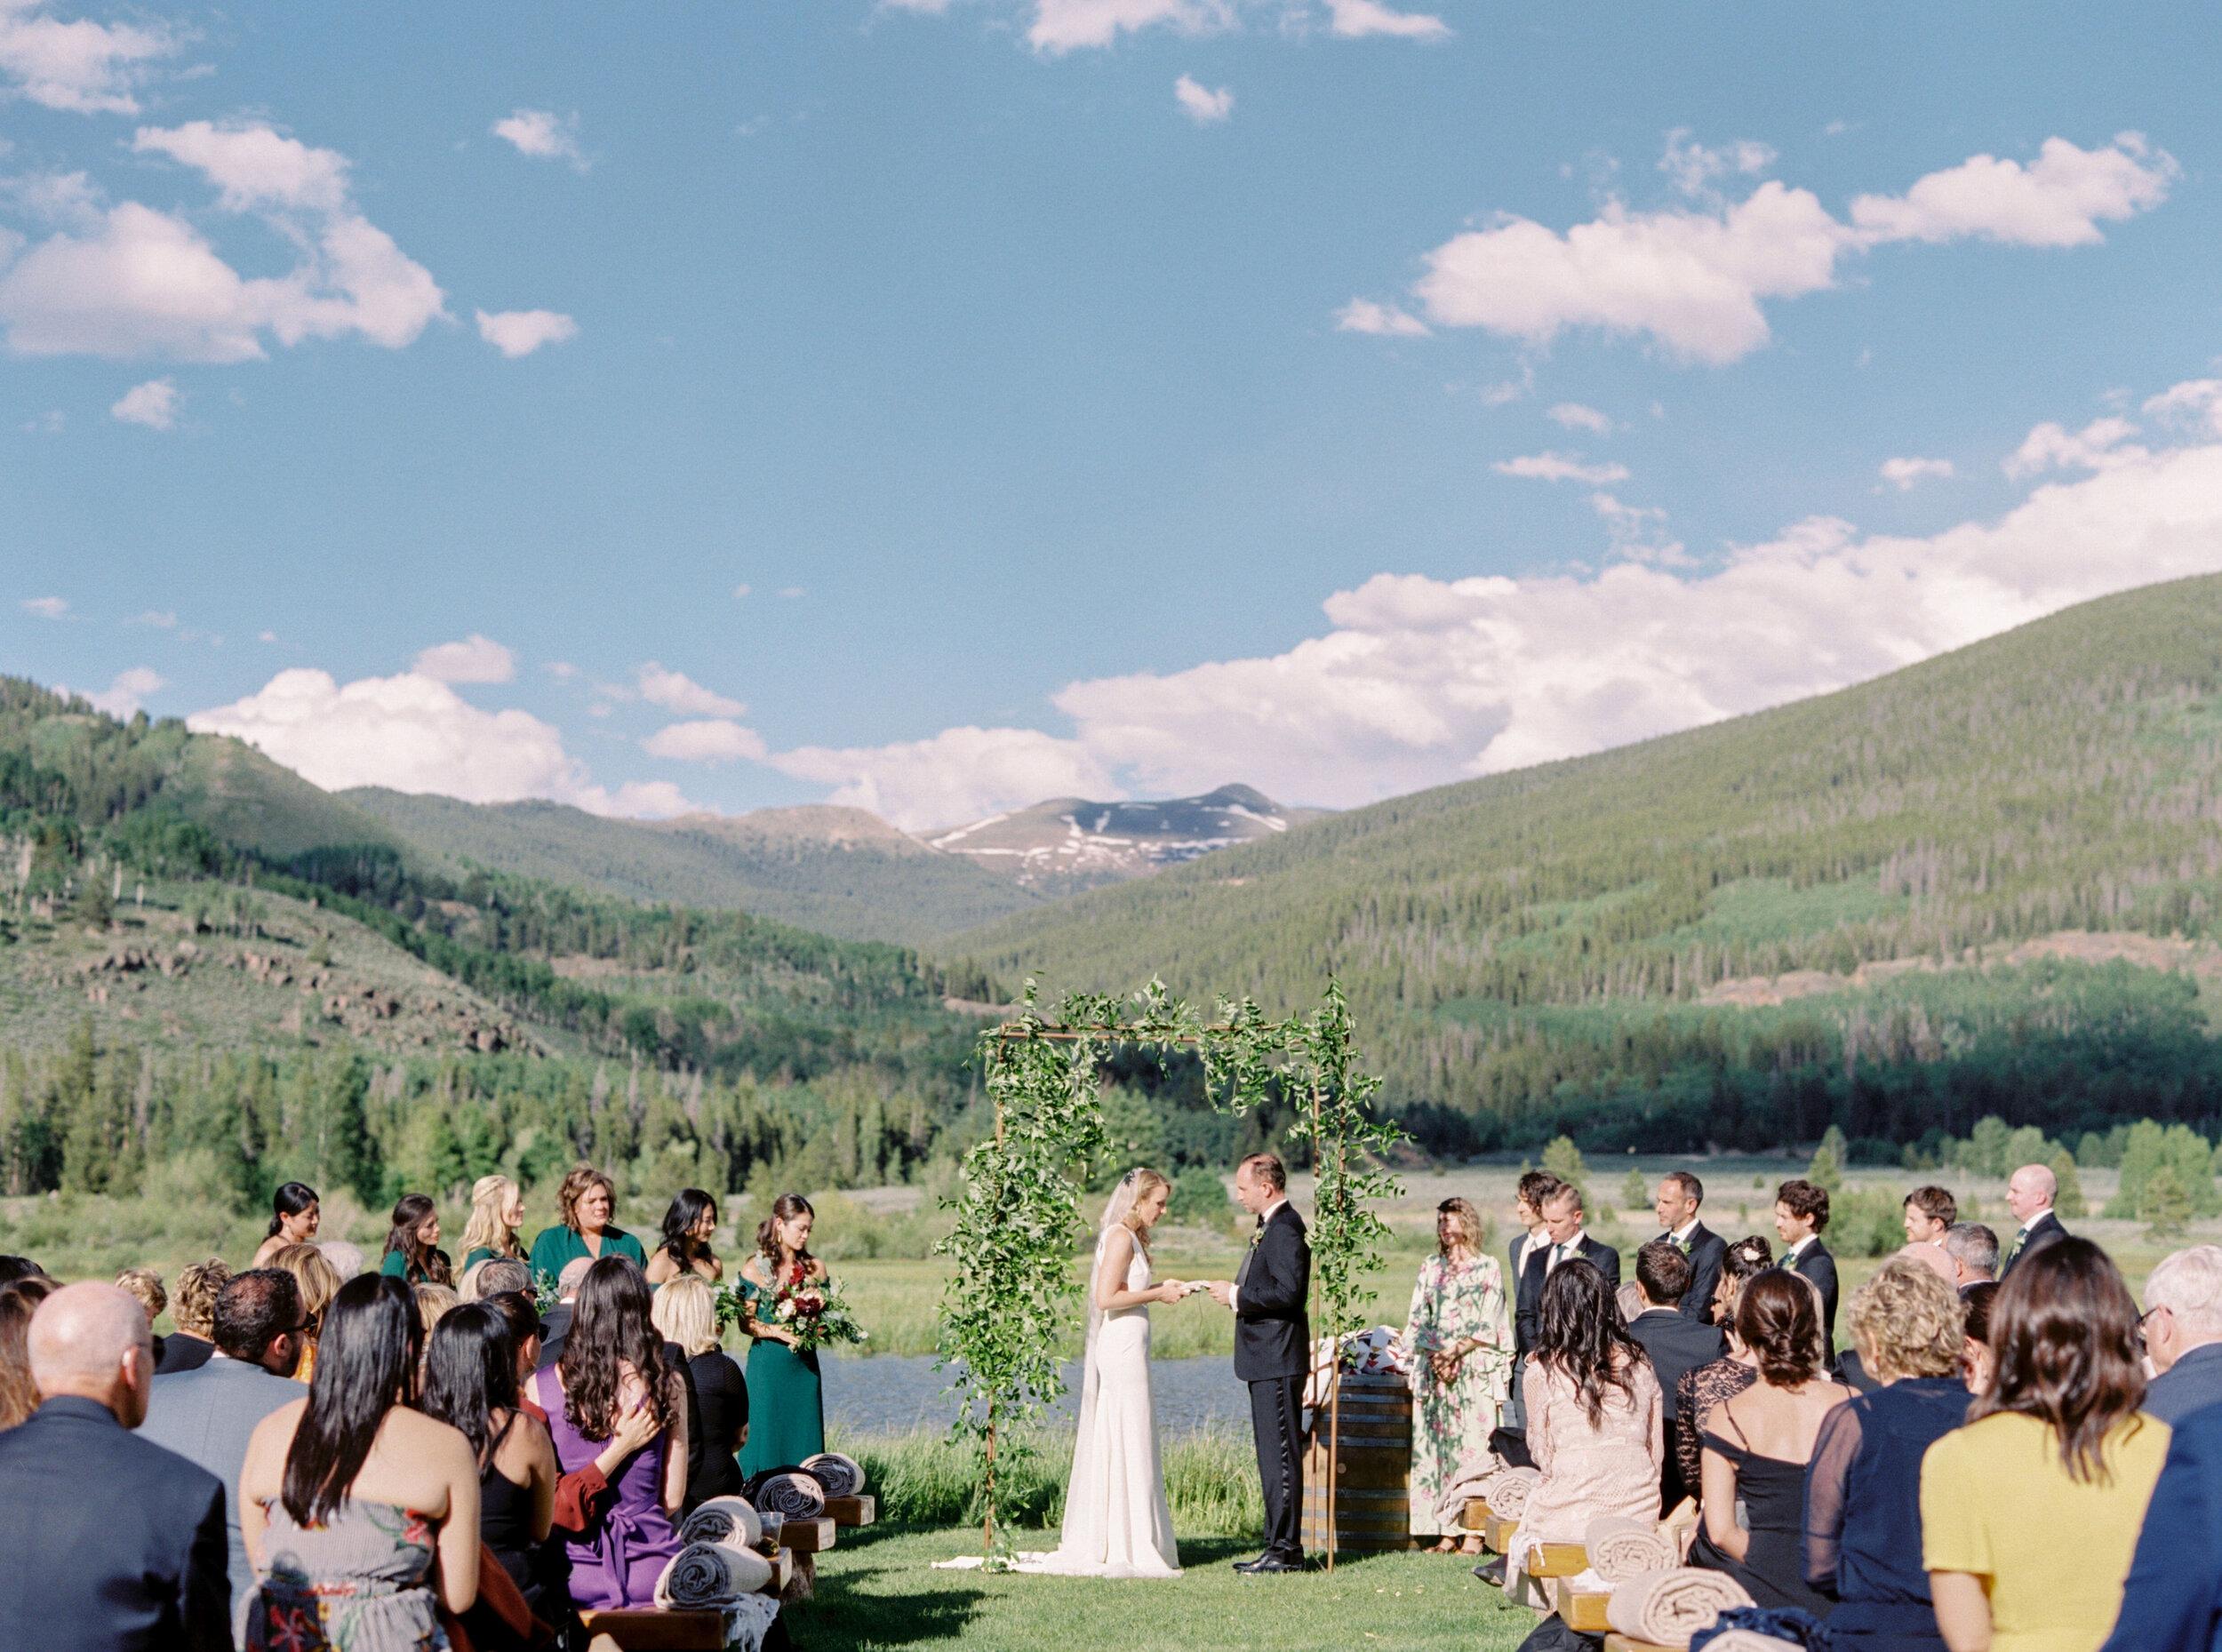 Dani-Cowan-Photography-Vail-Colorado-Film-Photography-Camp-Hale42.JPG